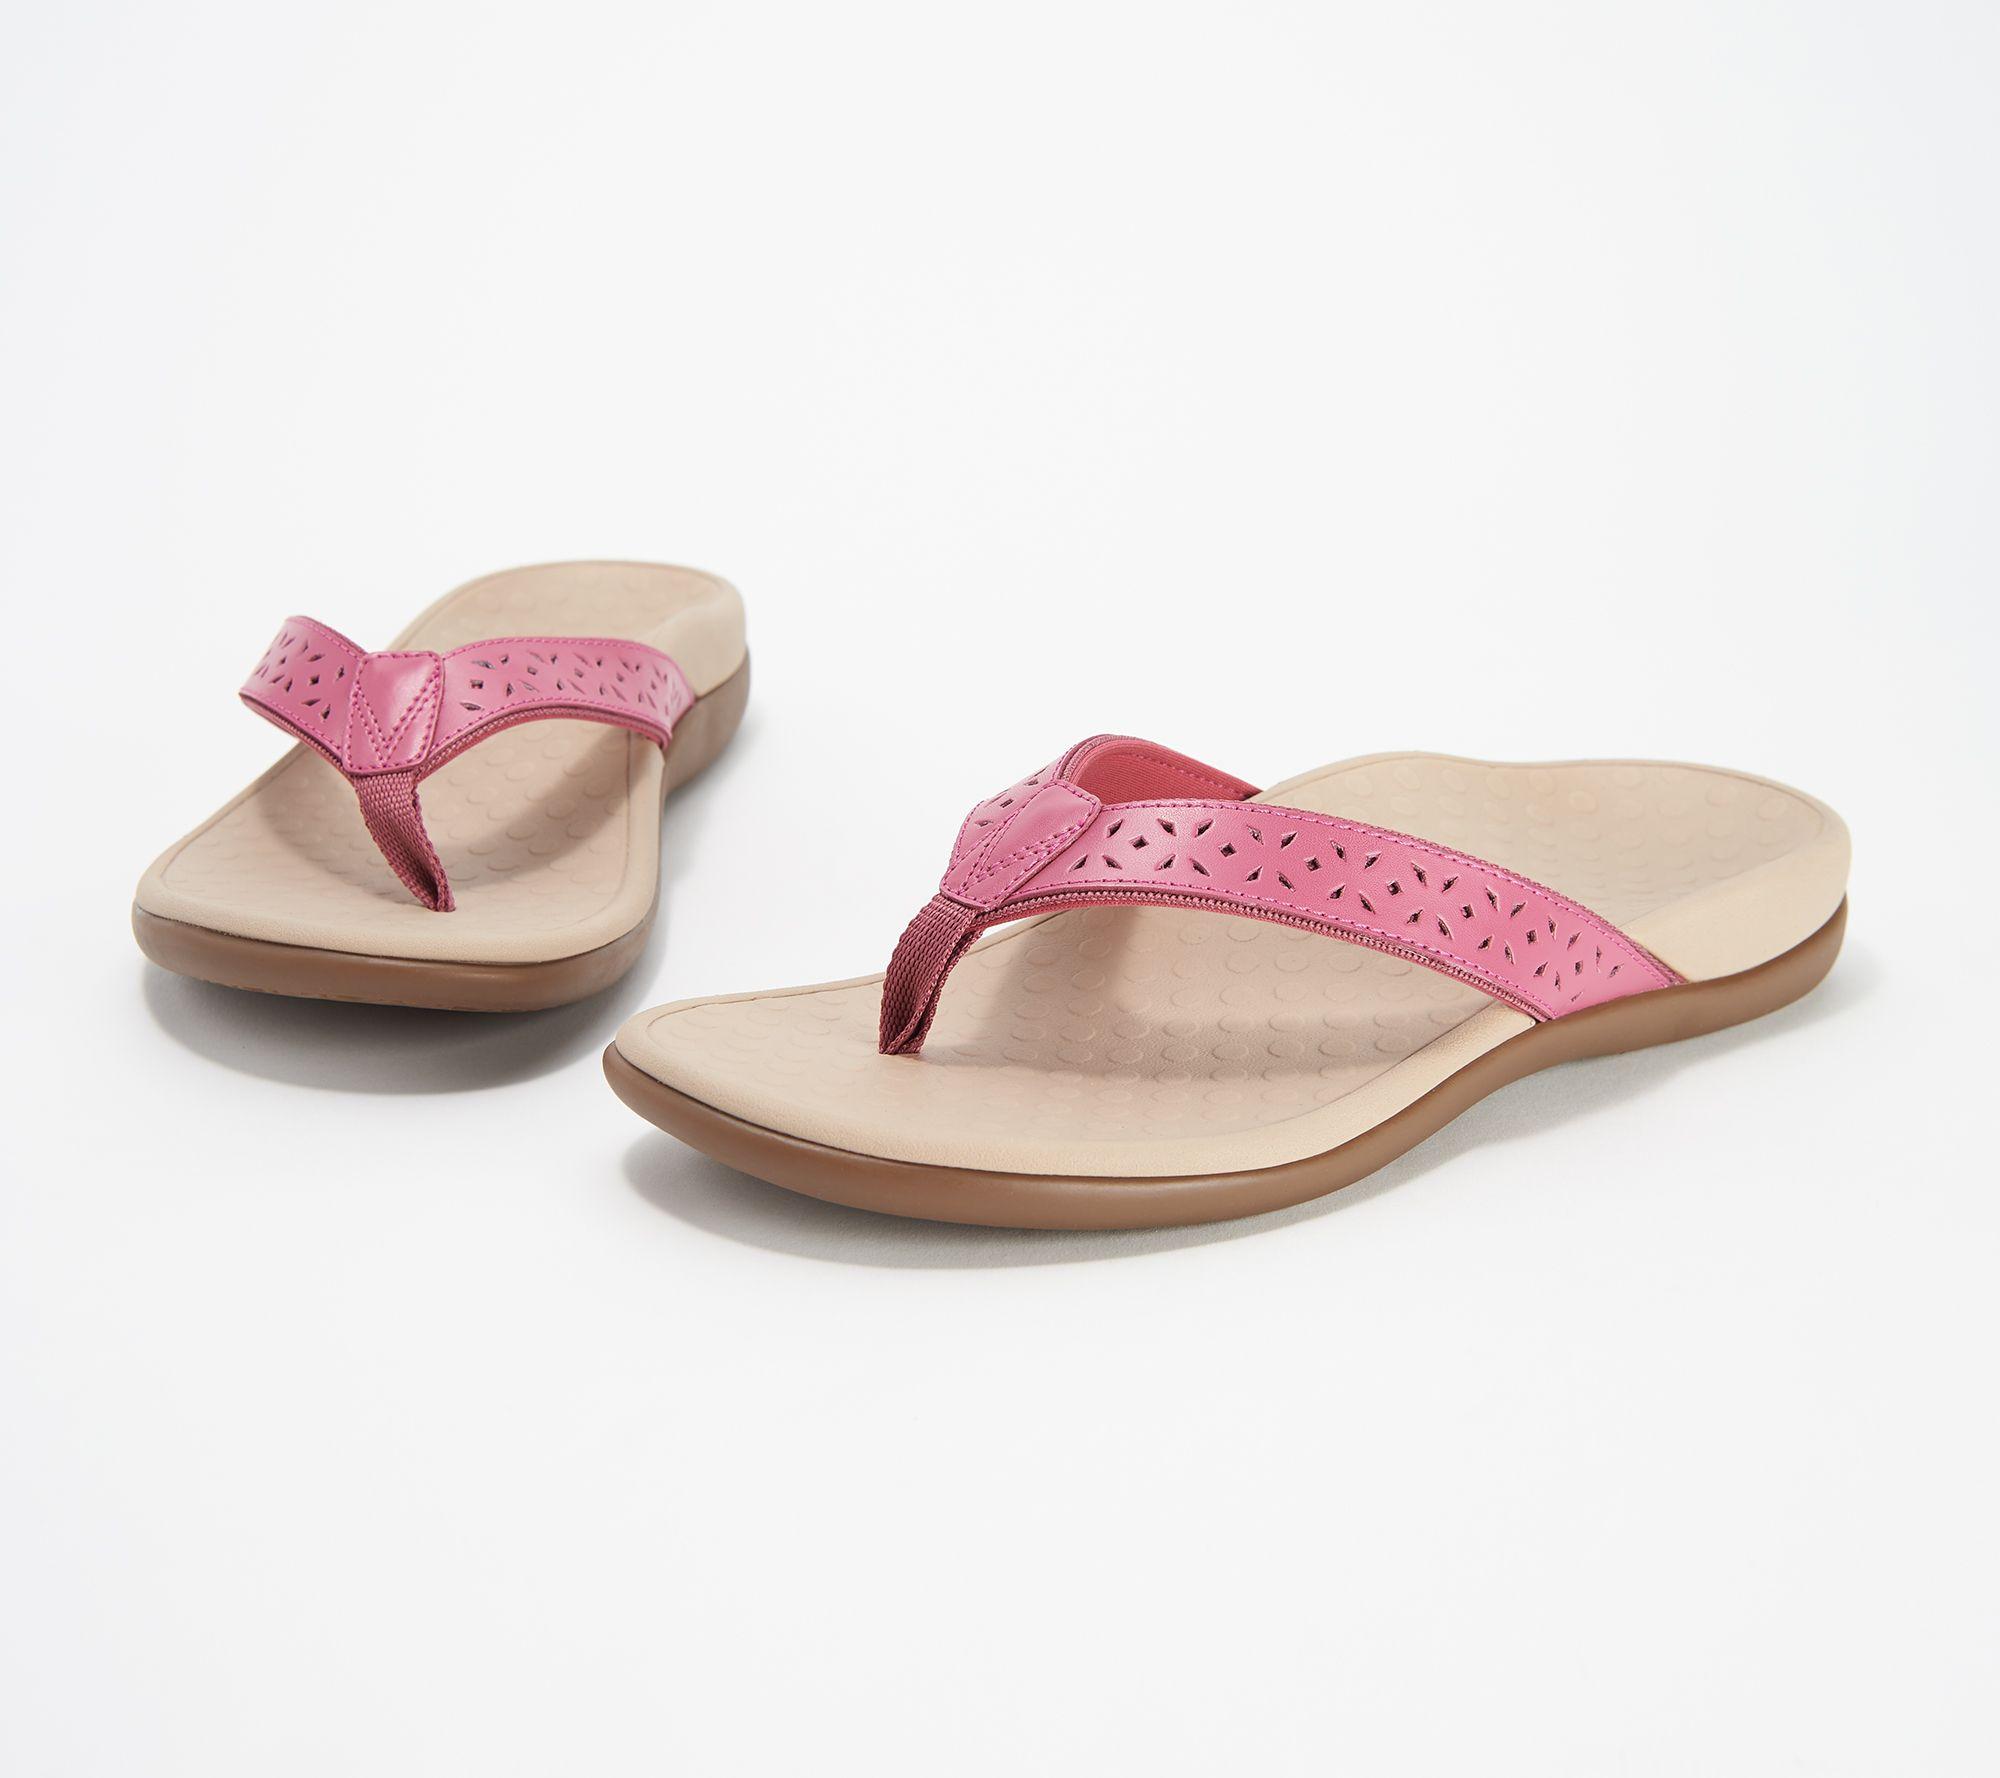 cc0c0fdb57e Vionic Leather Thong Sandals - Tide Anniversary - Page 1 — QVC.com